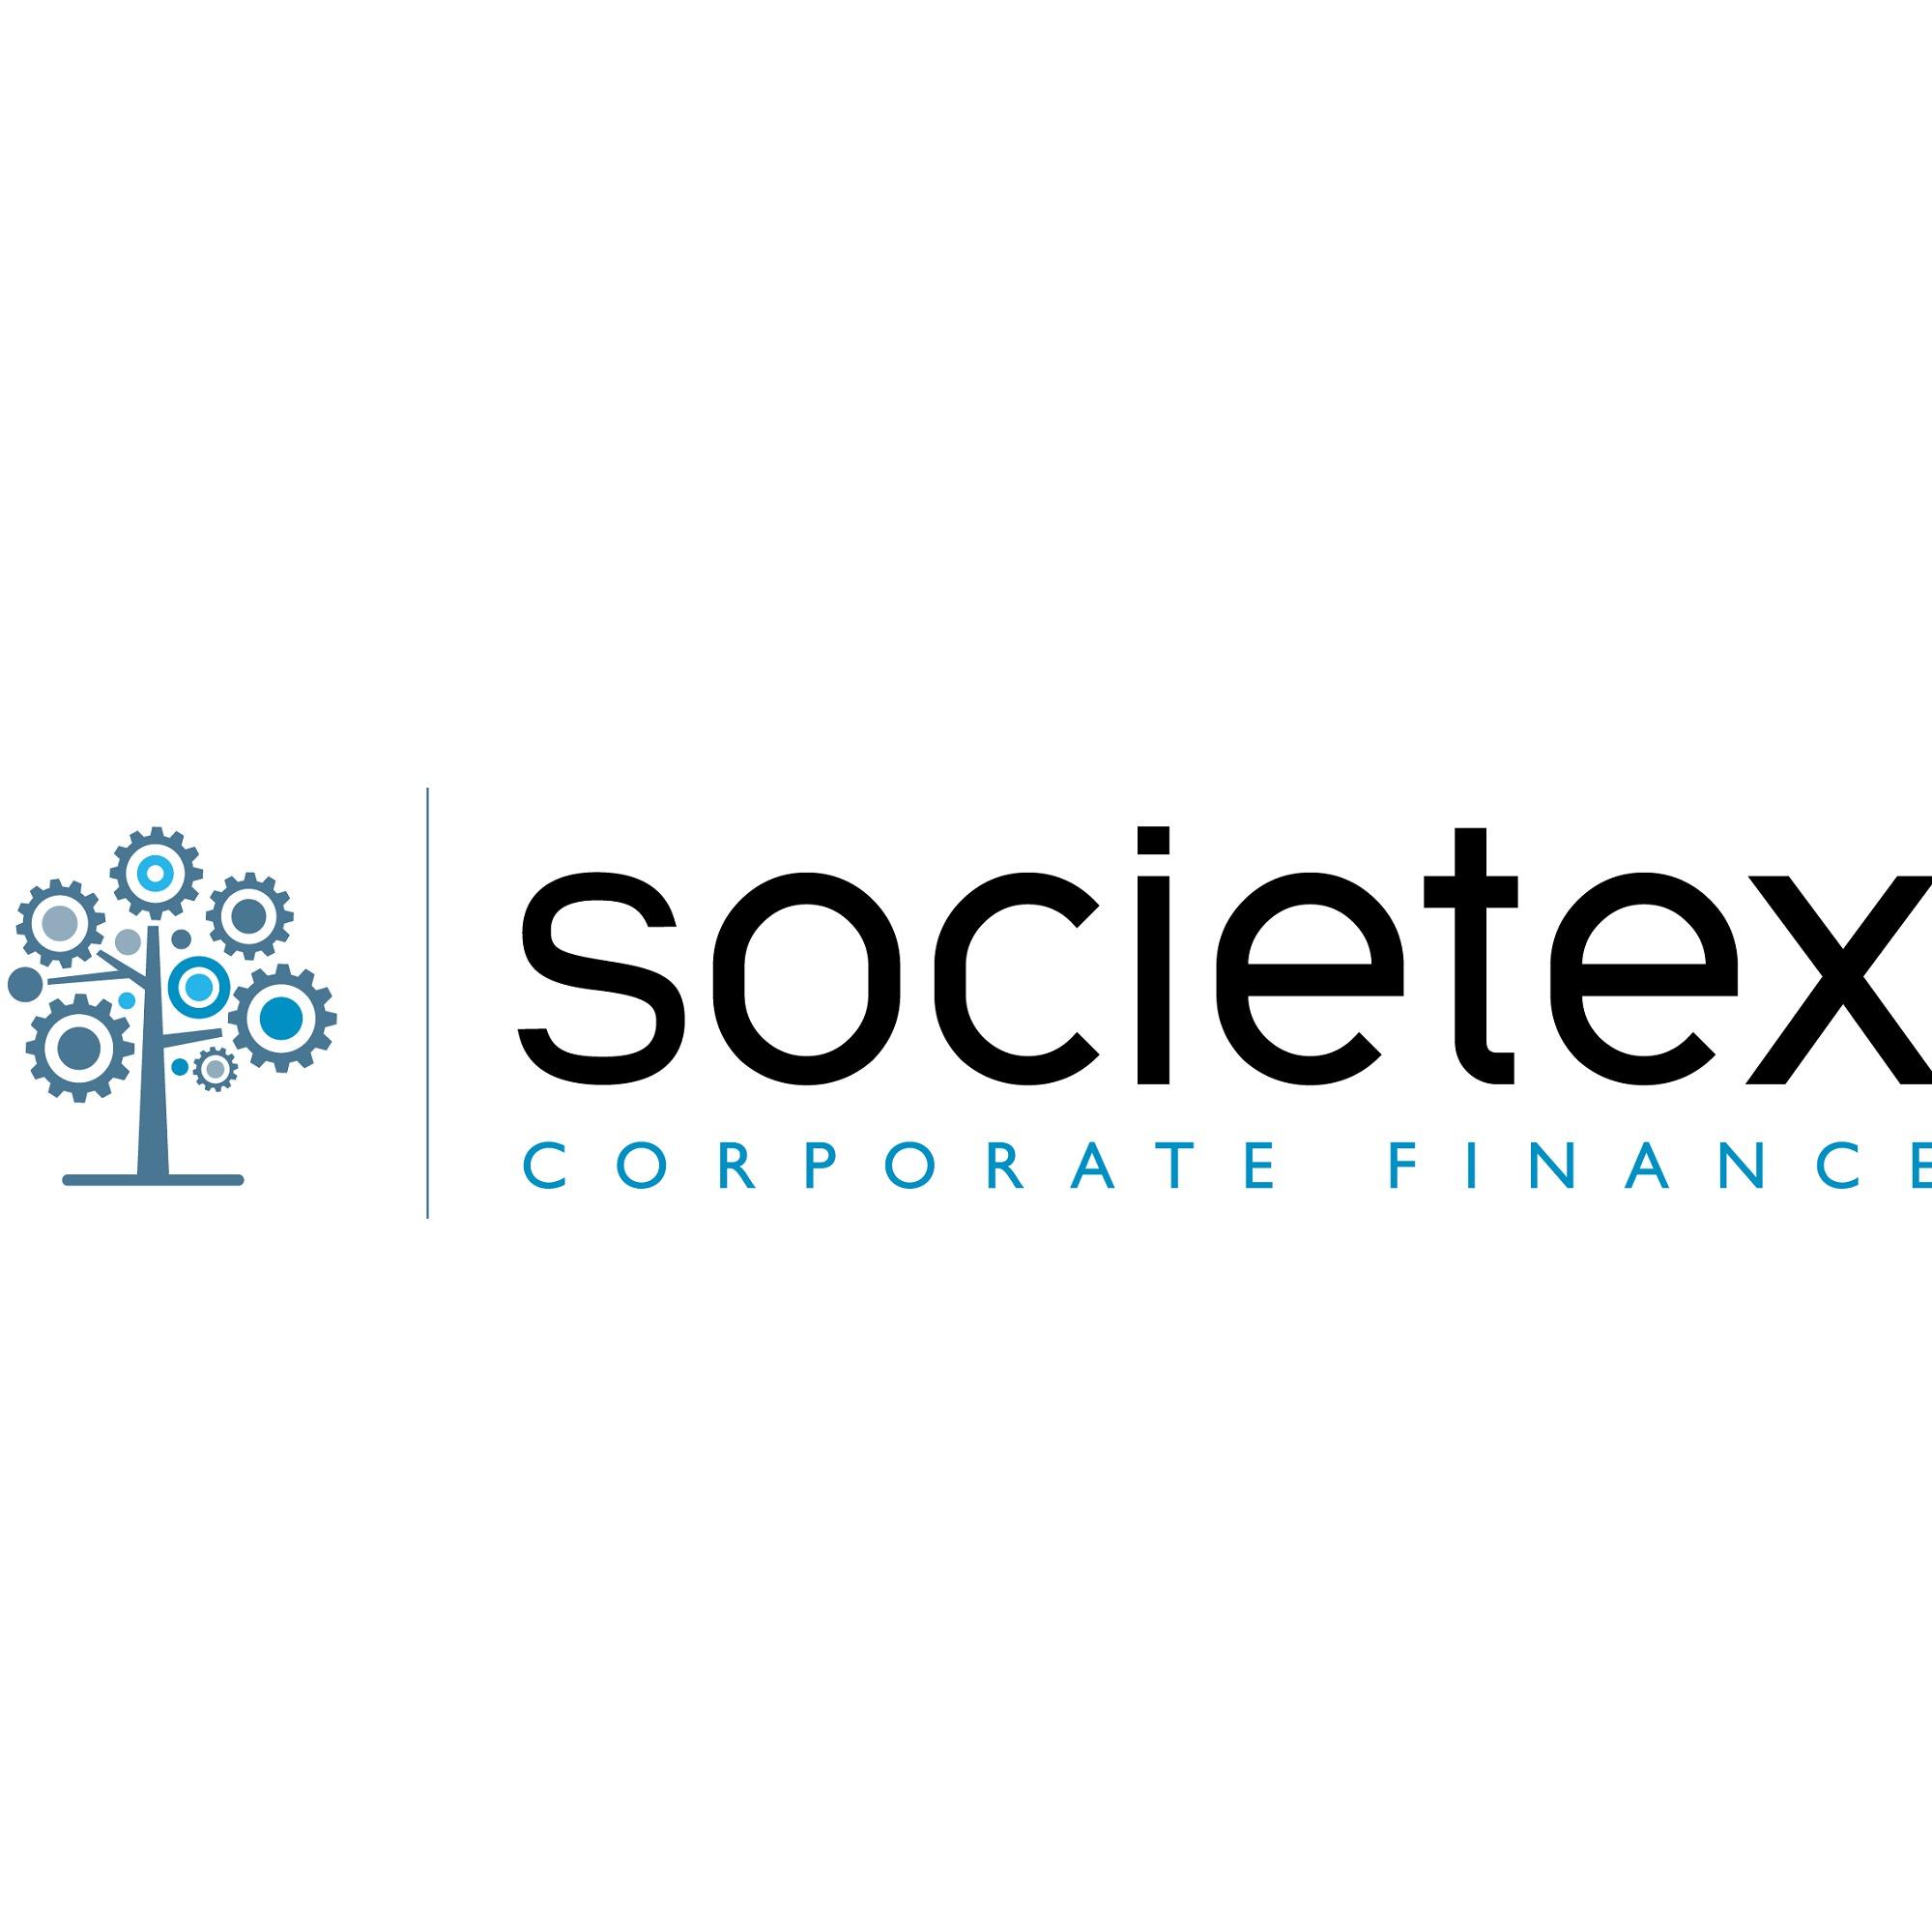 the Societex Corporate Finance logo.